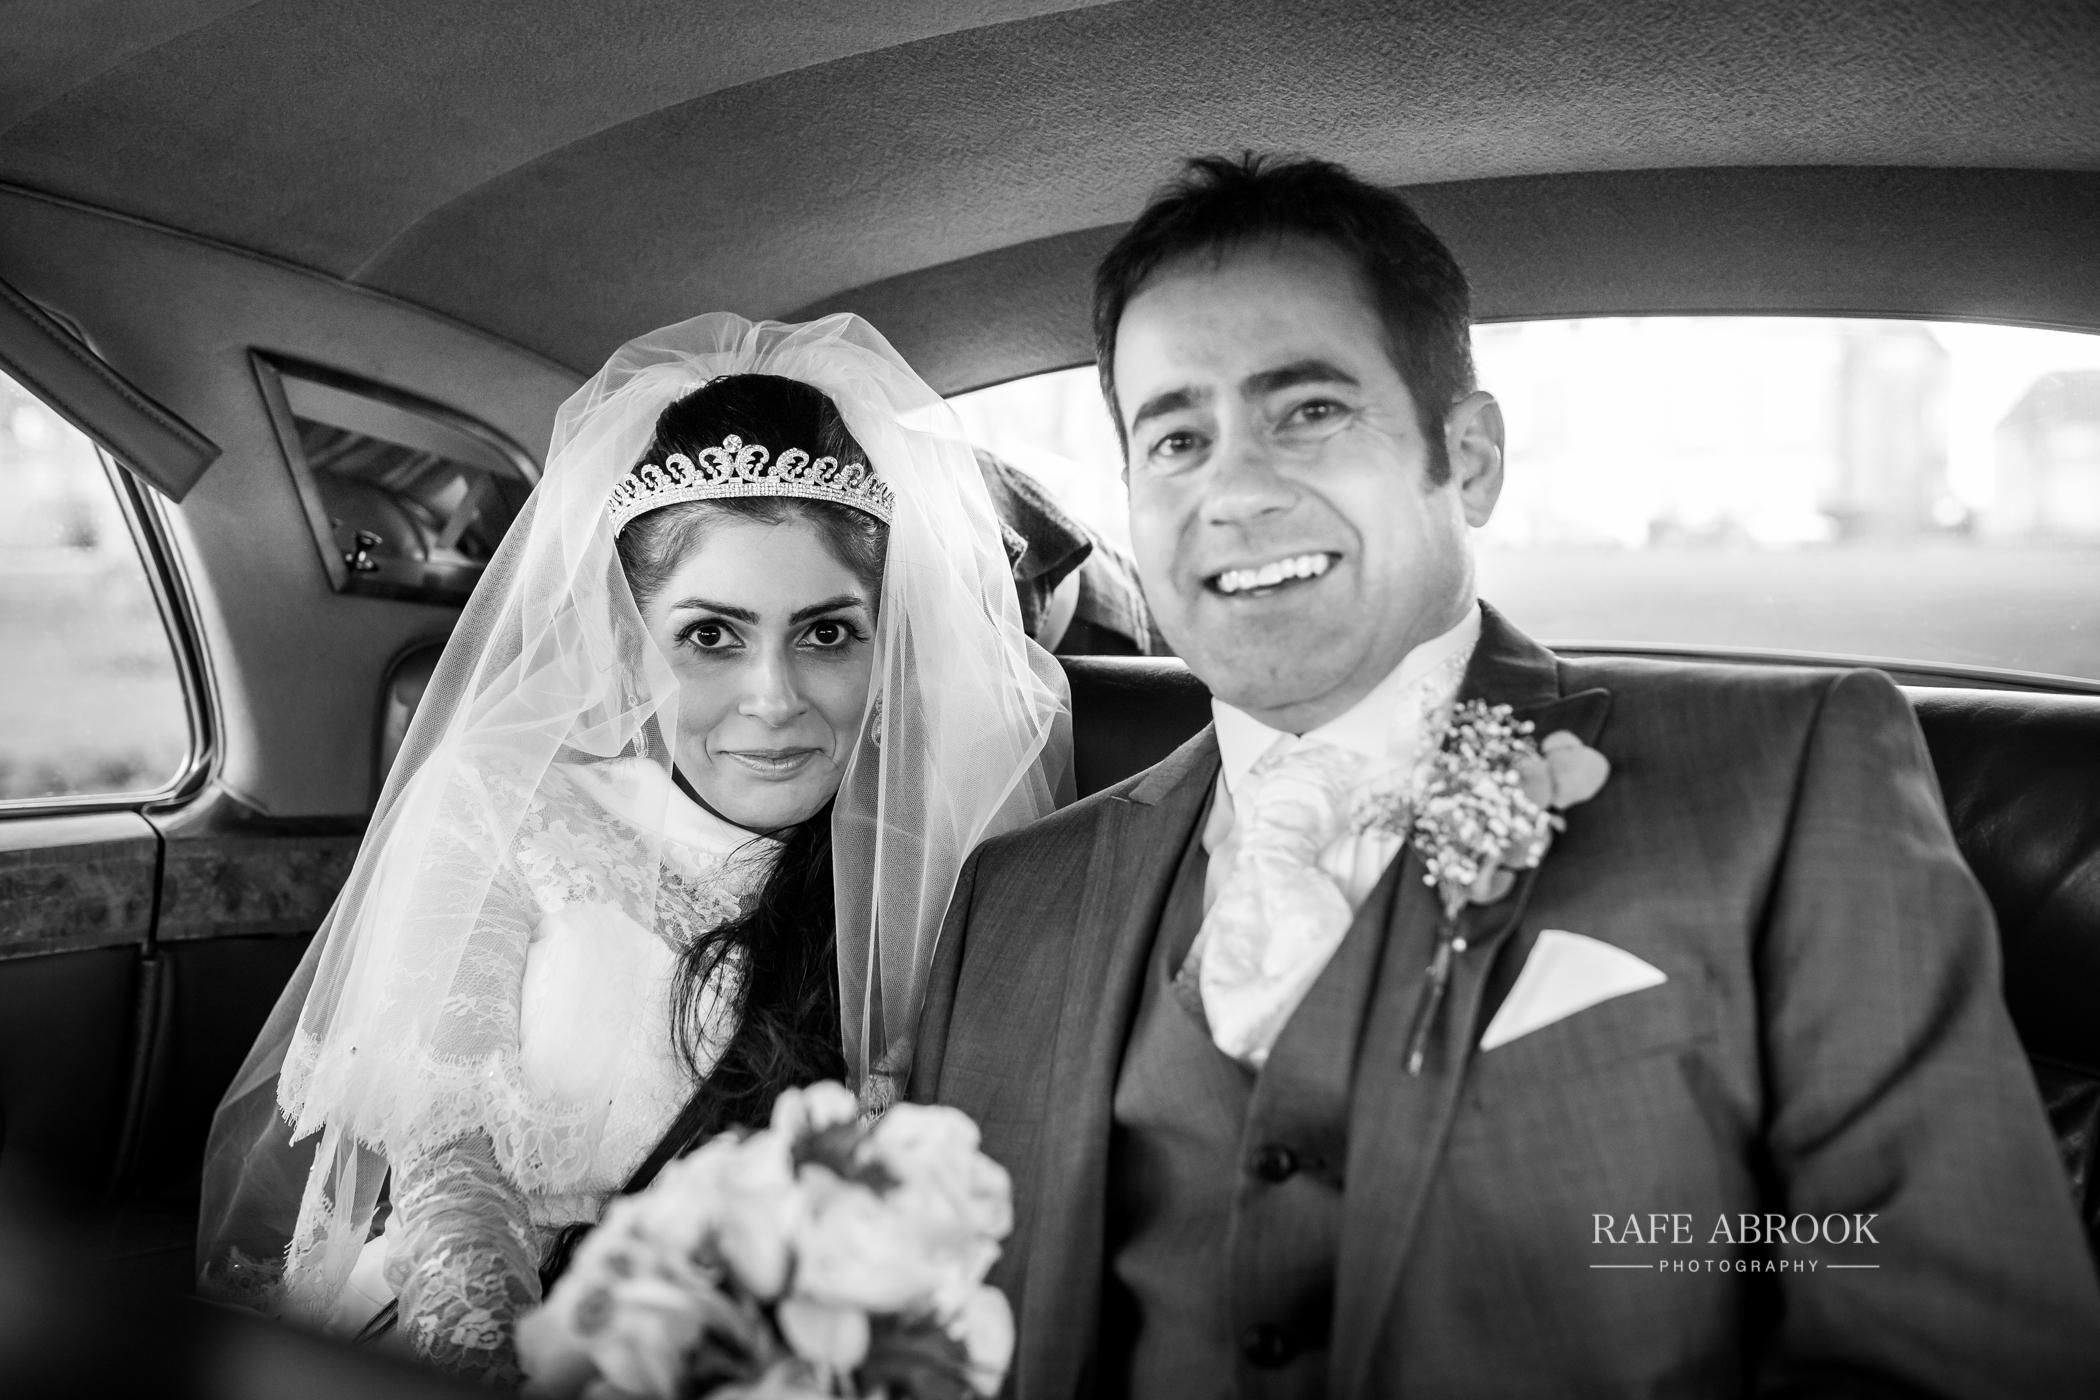 roma & pete wedding hampstead shenley hertfordshire -338.jpg